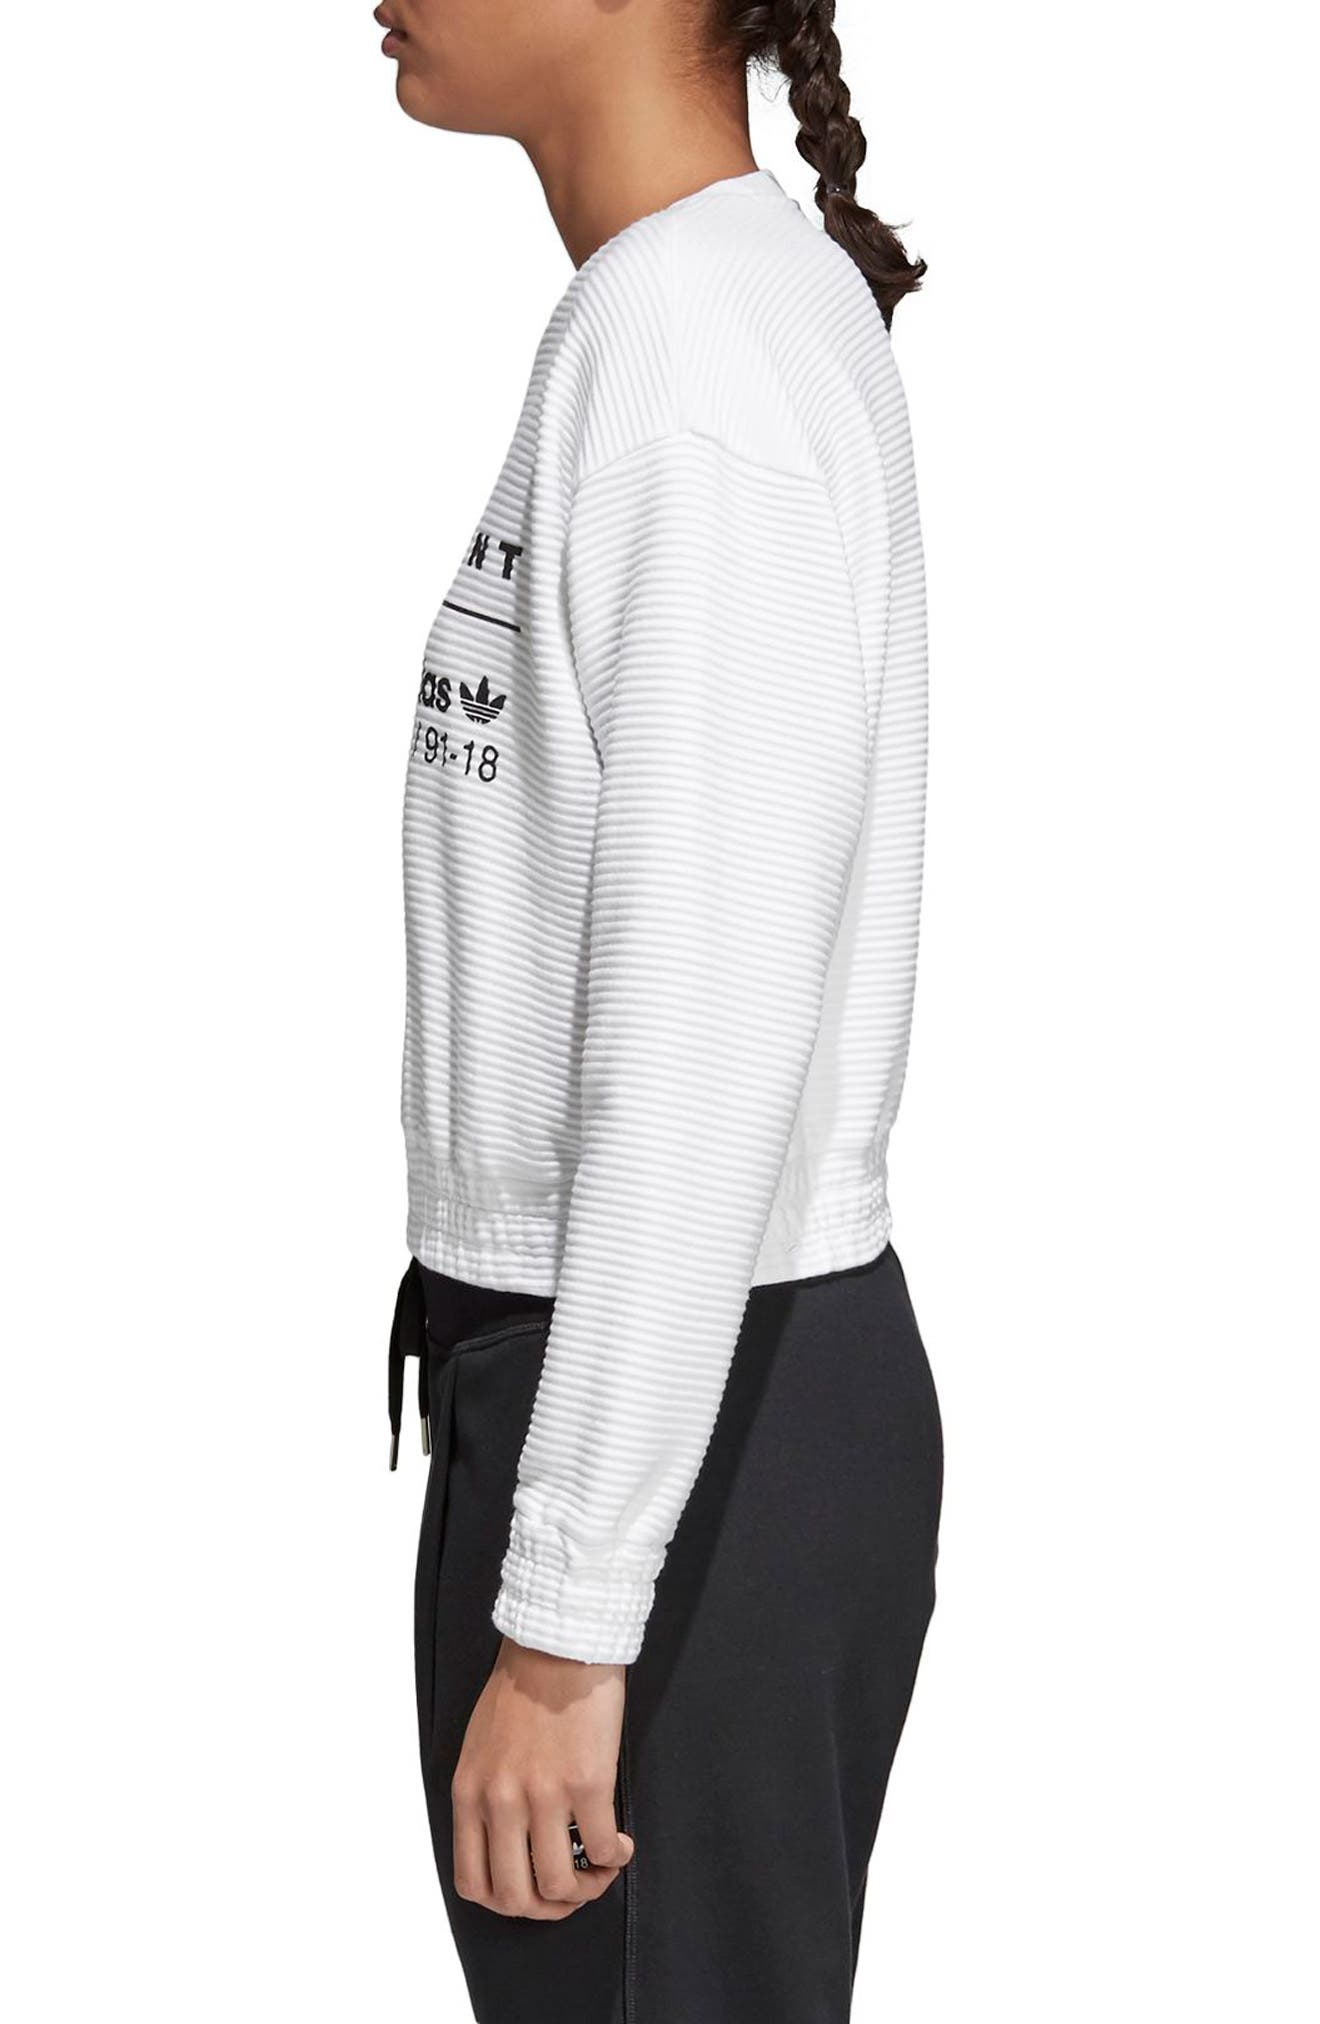 EQT Sweatshirt,                             Alternate thumbnail 3, color,                             White